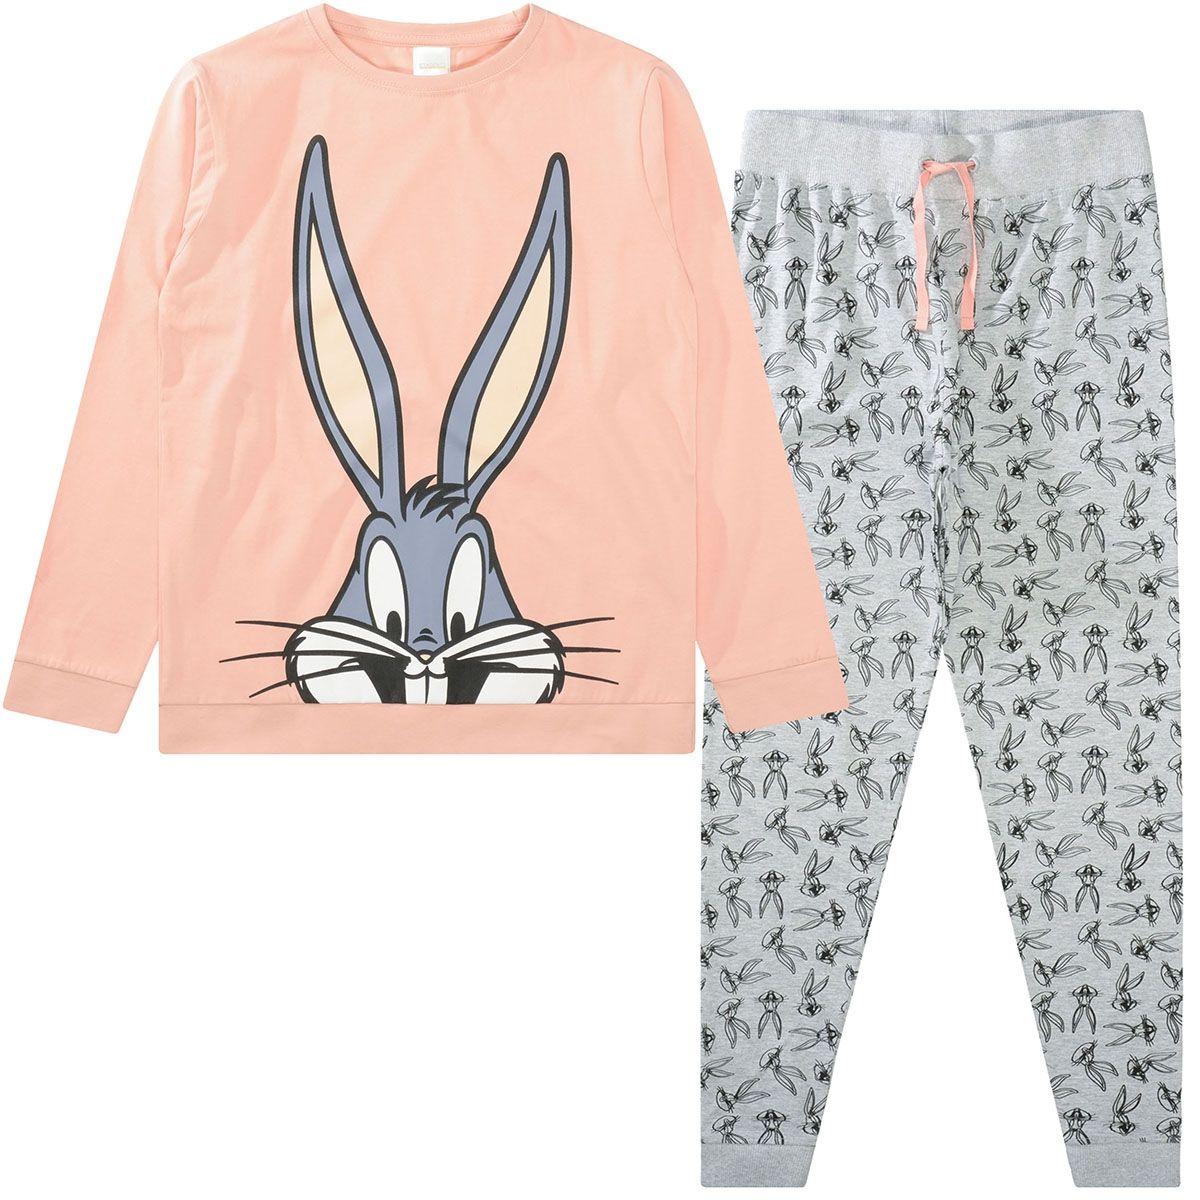 Pyjama Bugs Bunny - Old Rose